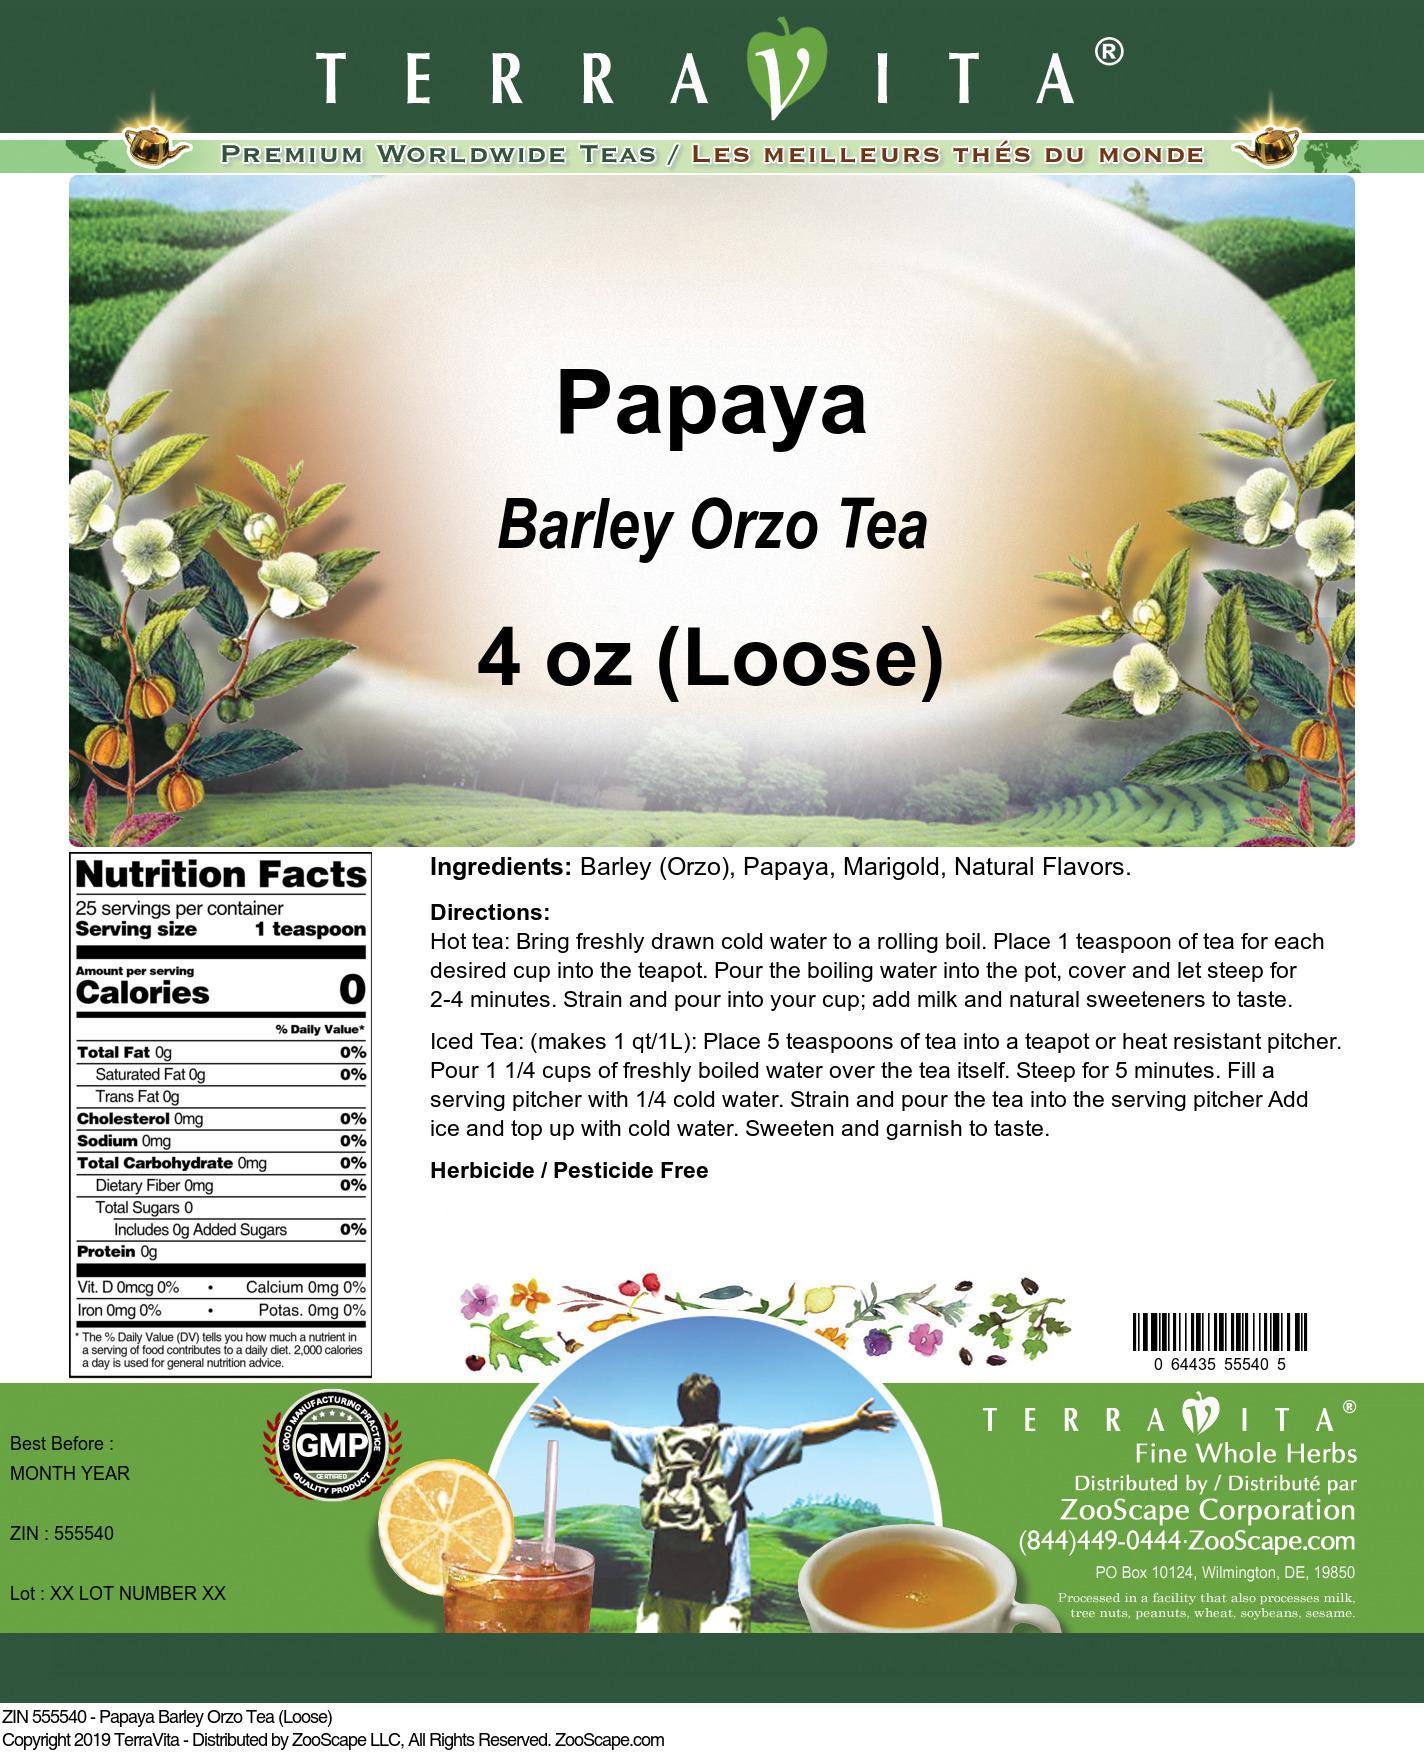 Papaya Barley Orzo Tea (Loose)